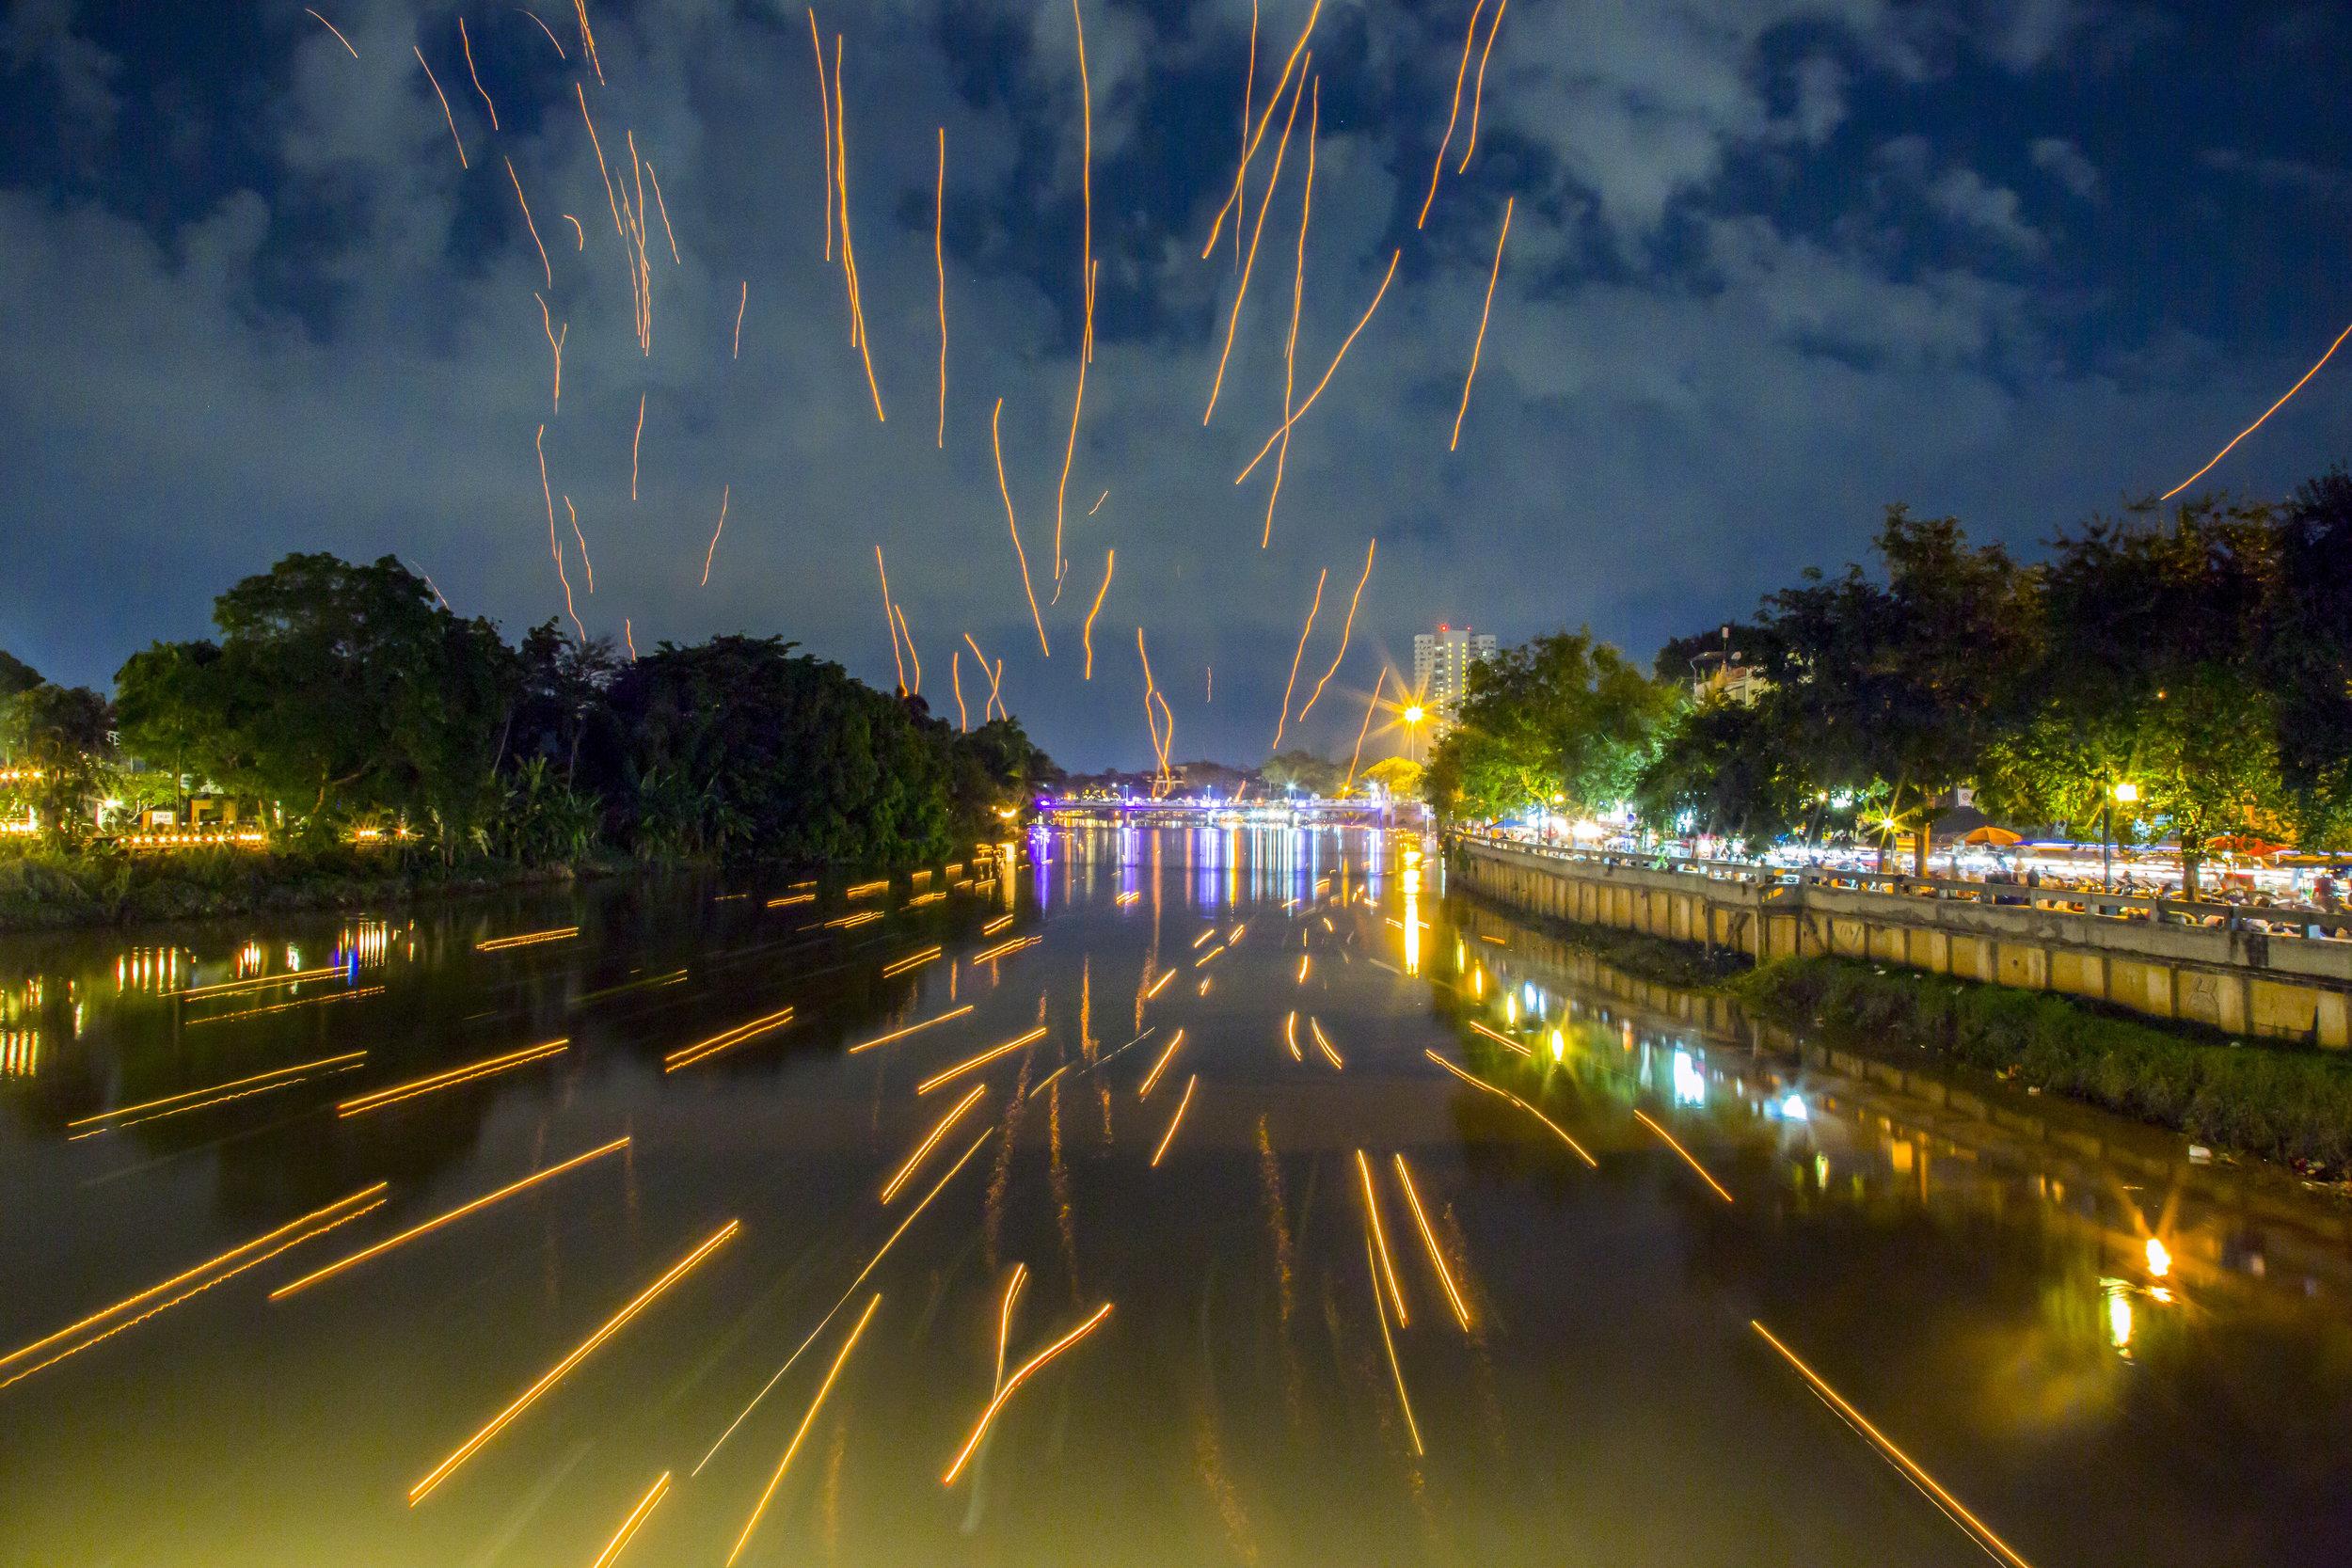 ChiangMai_Lanterns_01.jpg